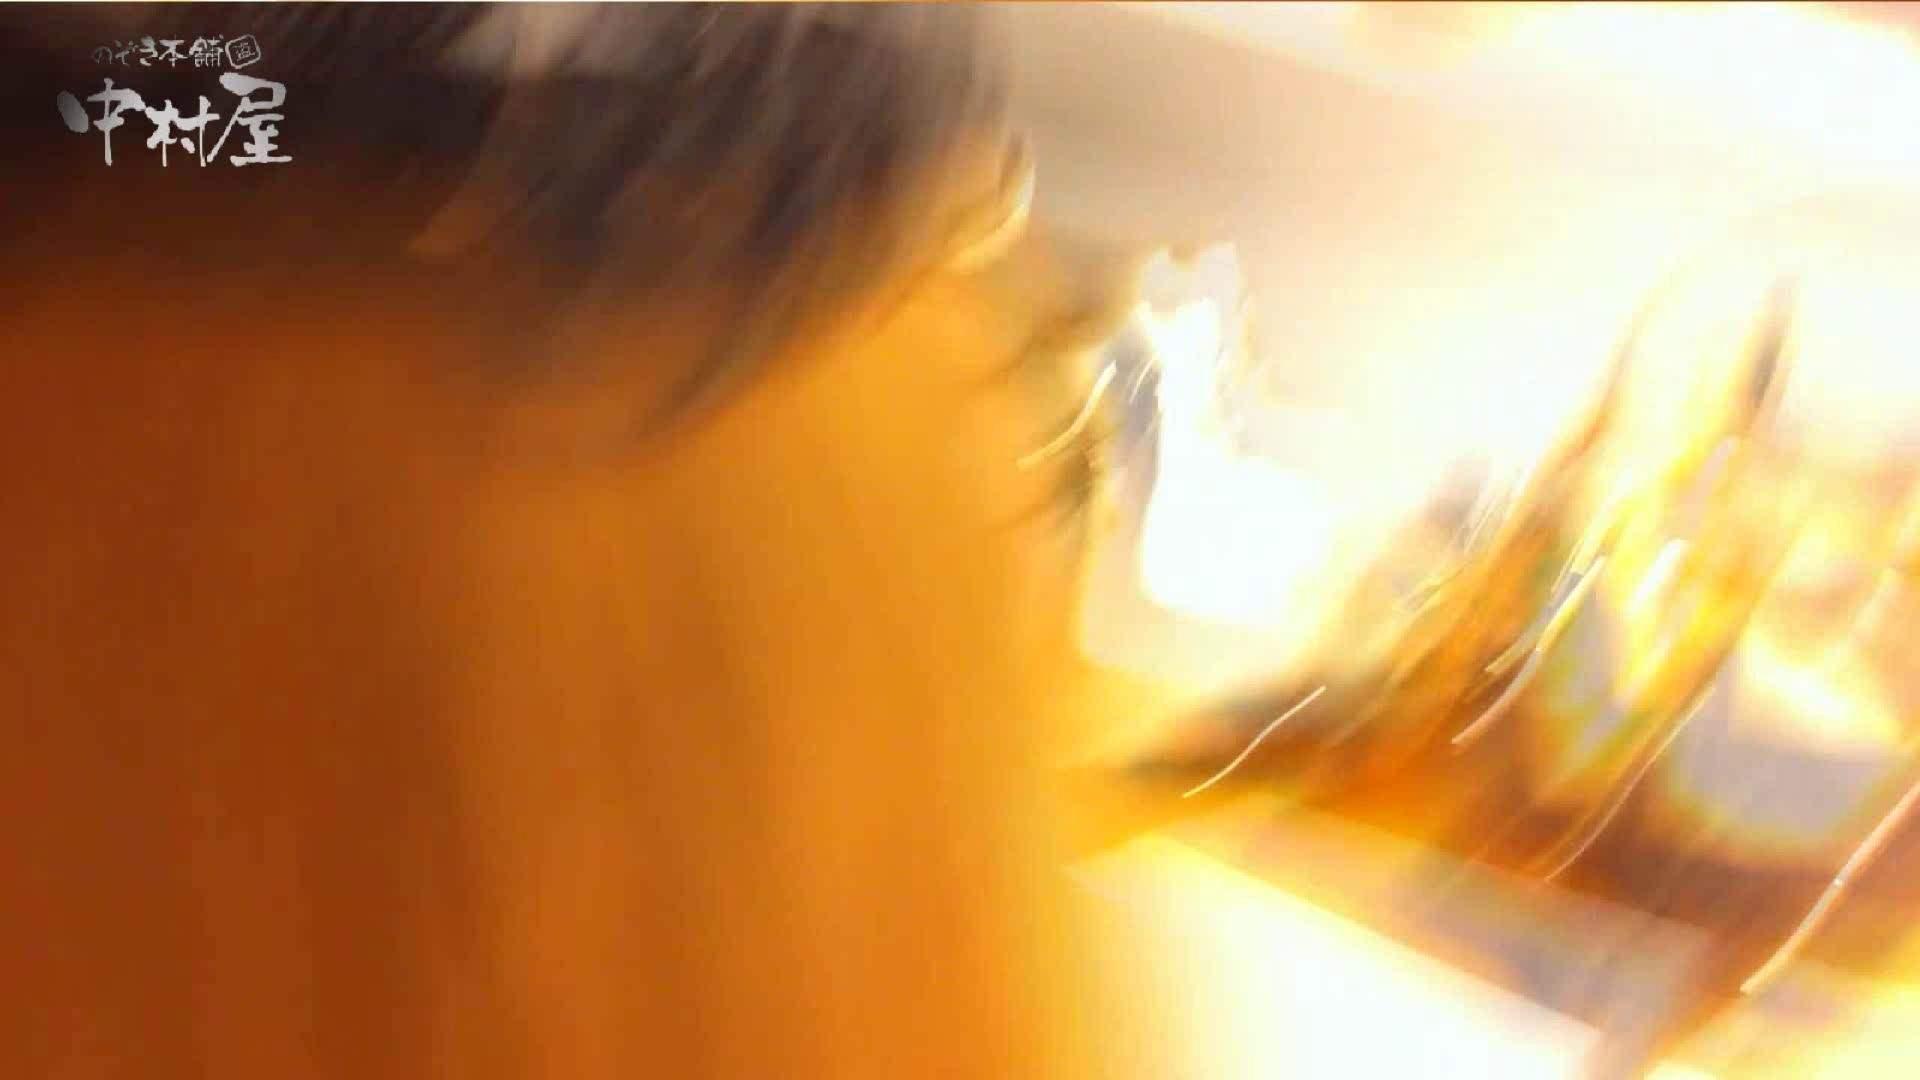 vol.84 美人アパレル胸チラ&パンチラ 帽子オネェさんに胸元アタック! 接写  94連発 23